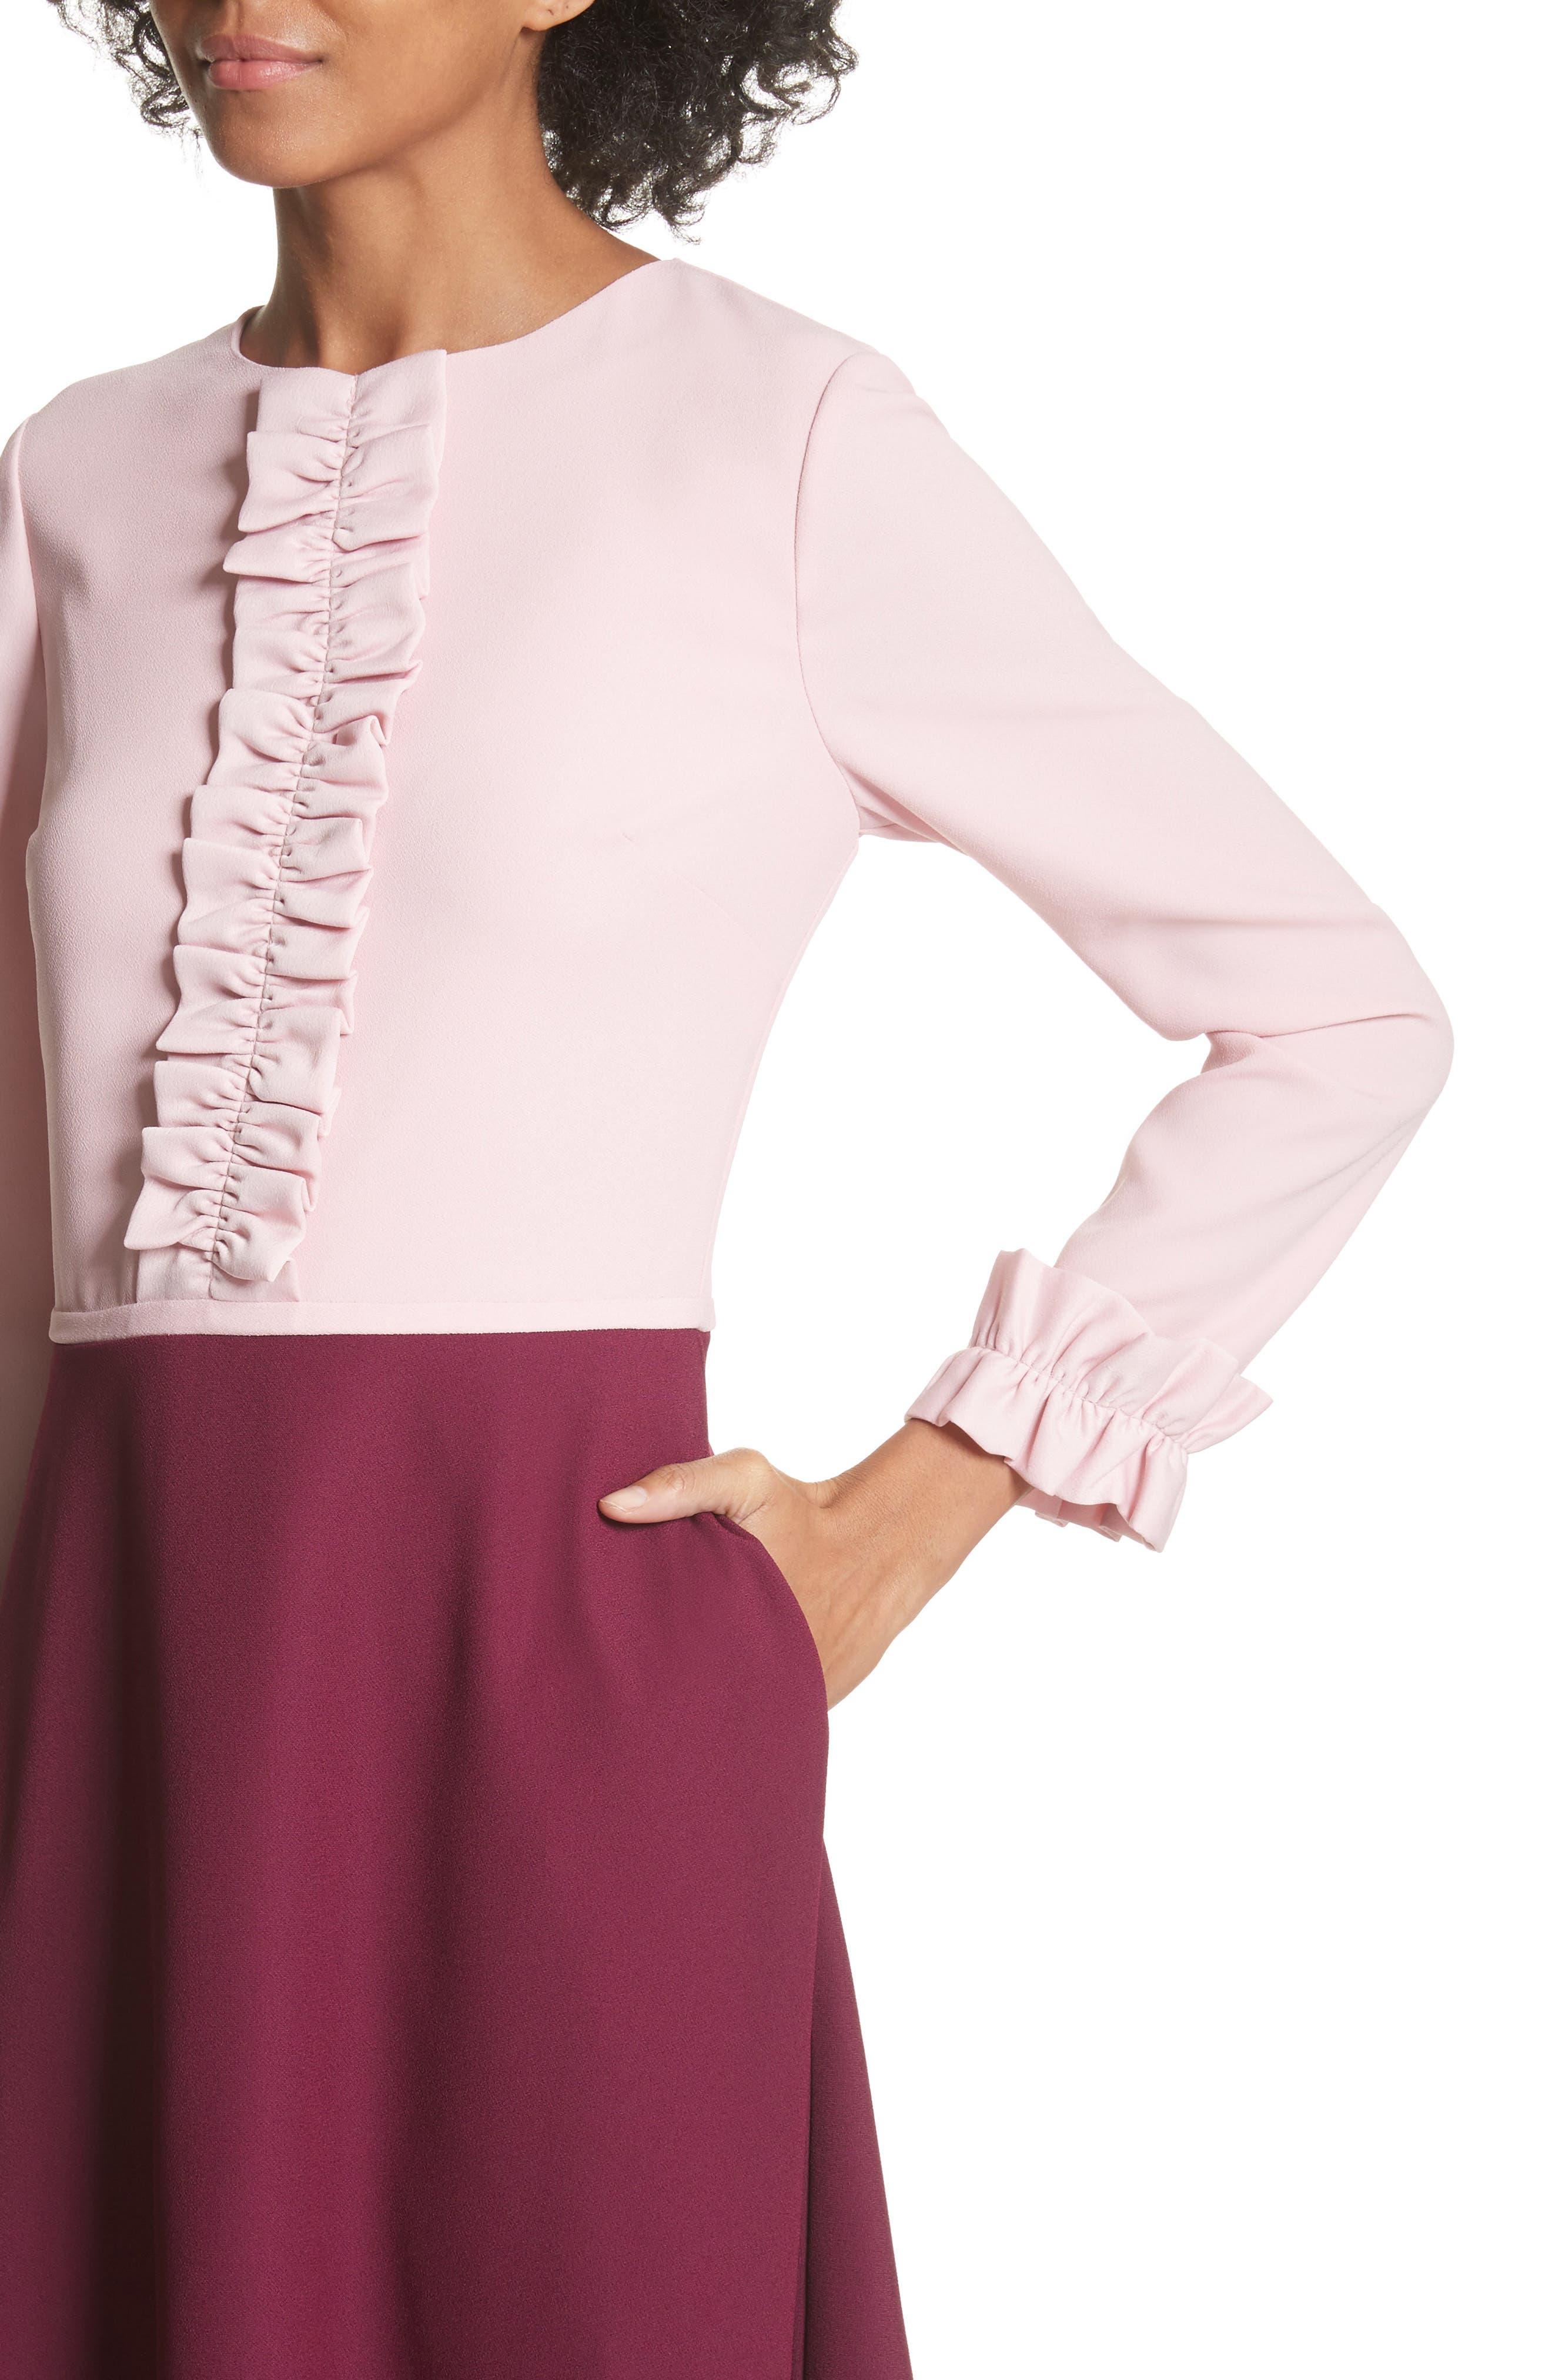 Steyla Ruffle Dress,                             Alternate thumbnail 4, color,                             652